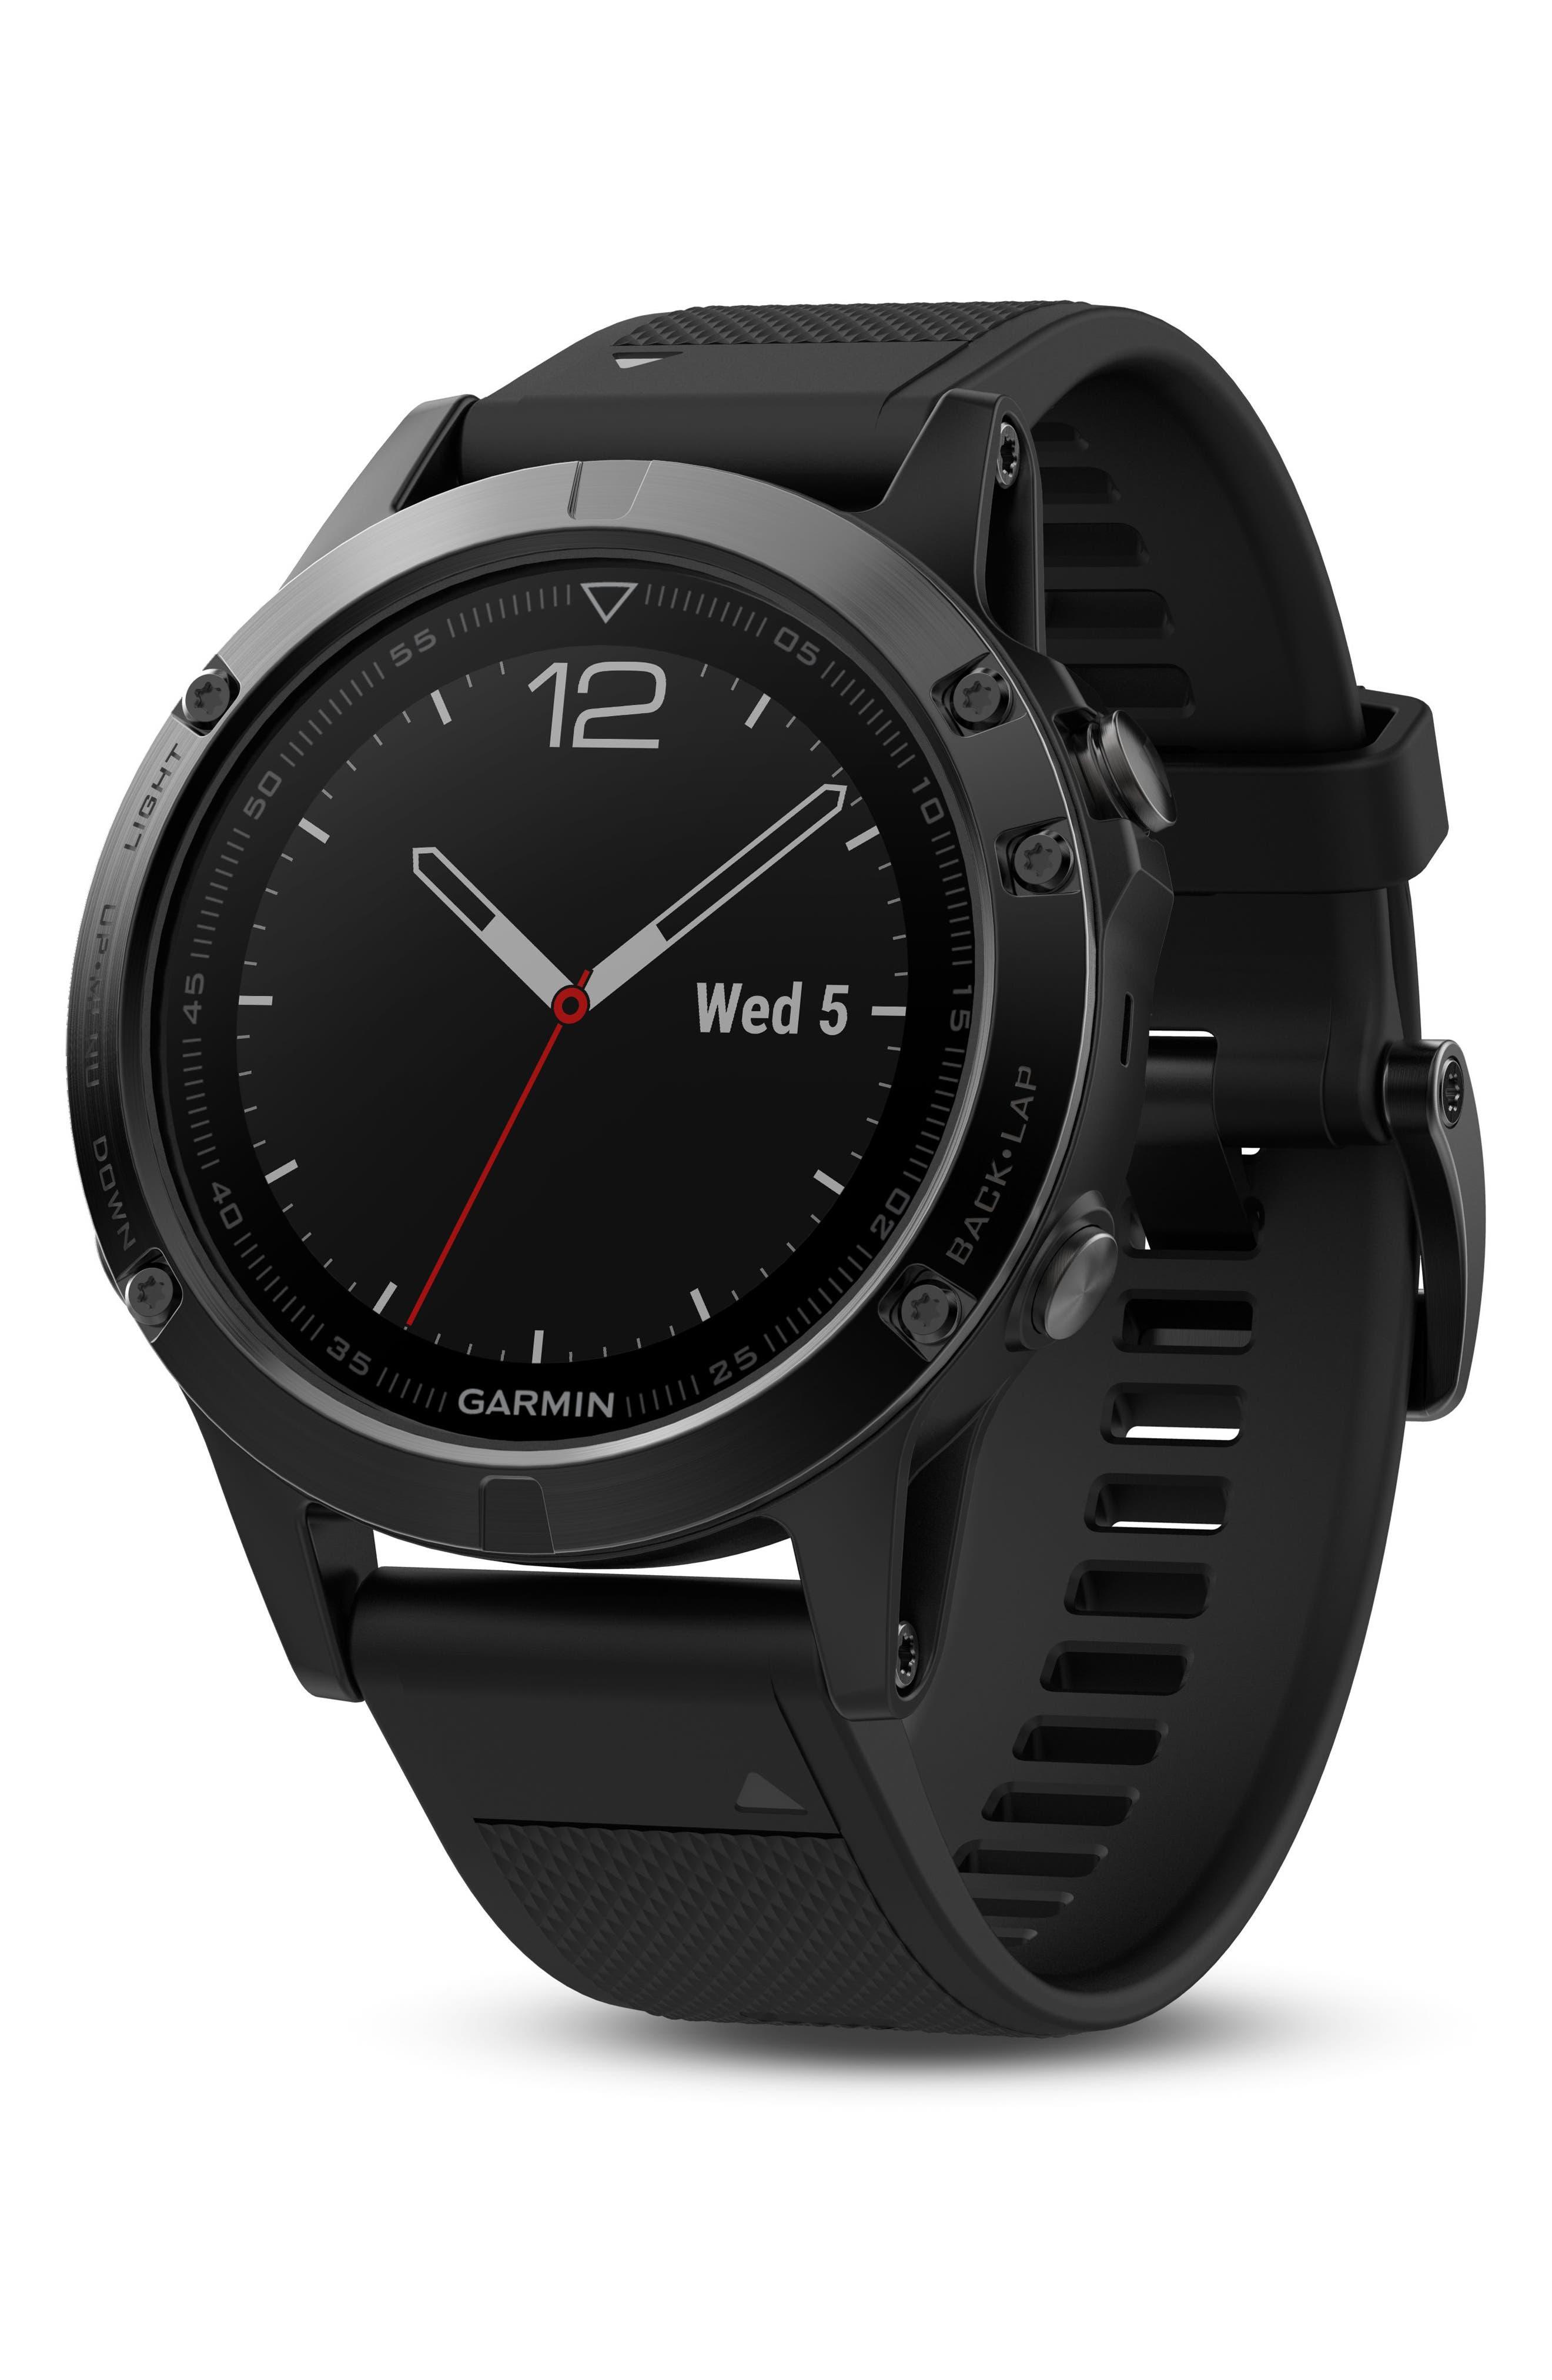 fenix<sup>®</sup> 5 Sapphire Premium Multisport GPS Watch, 47mm,                         Main,                         color, Black/ Black Sapphire